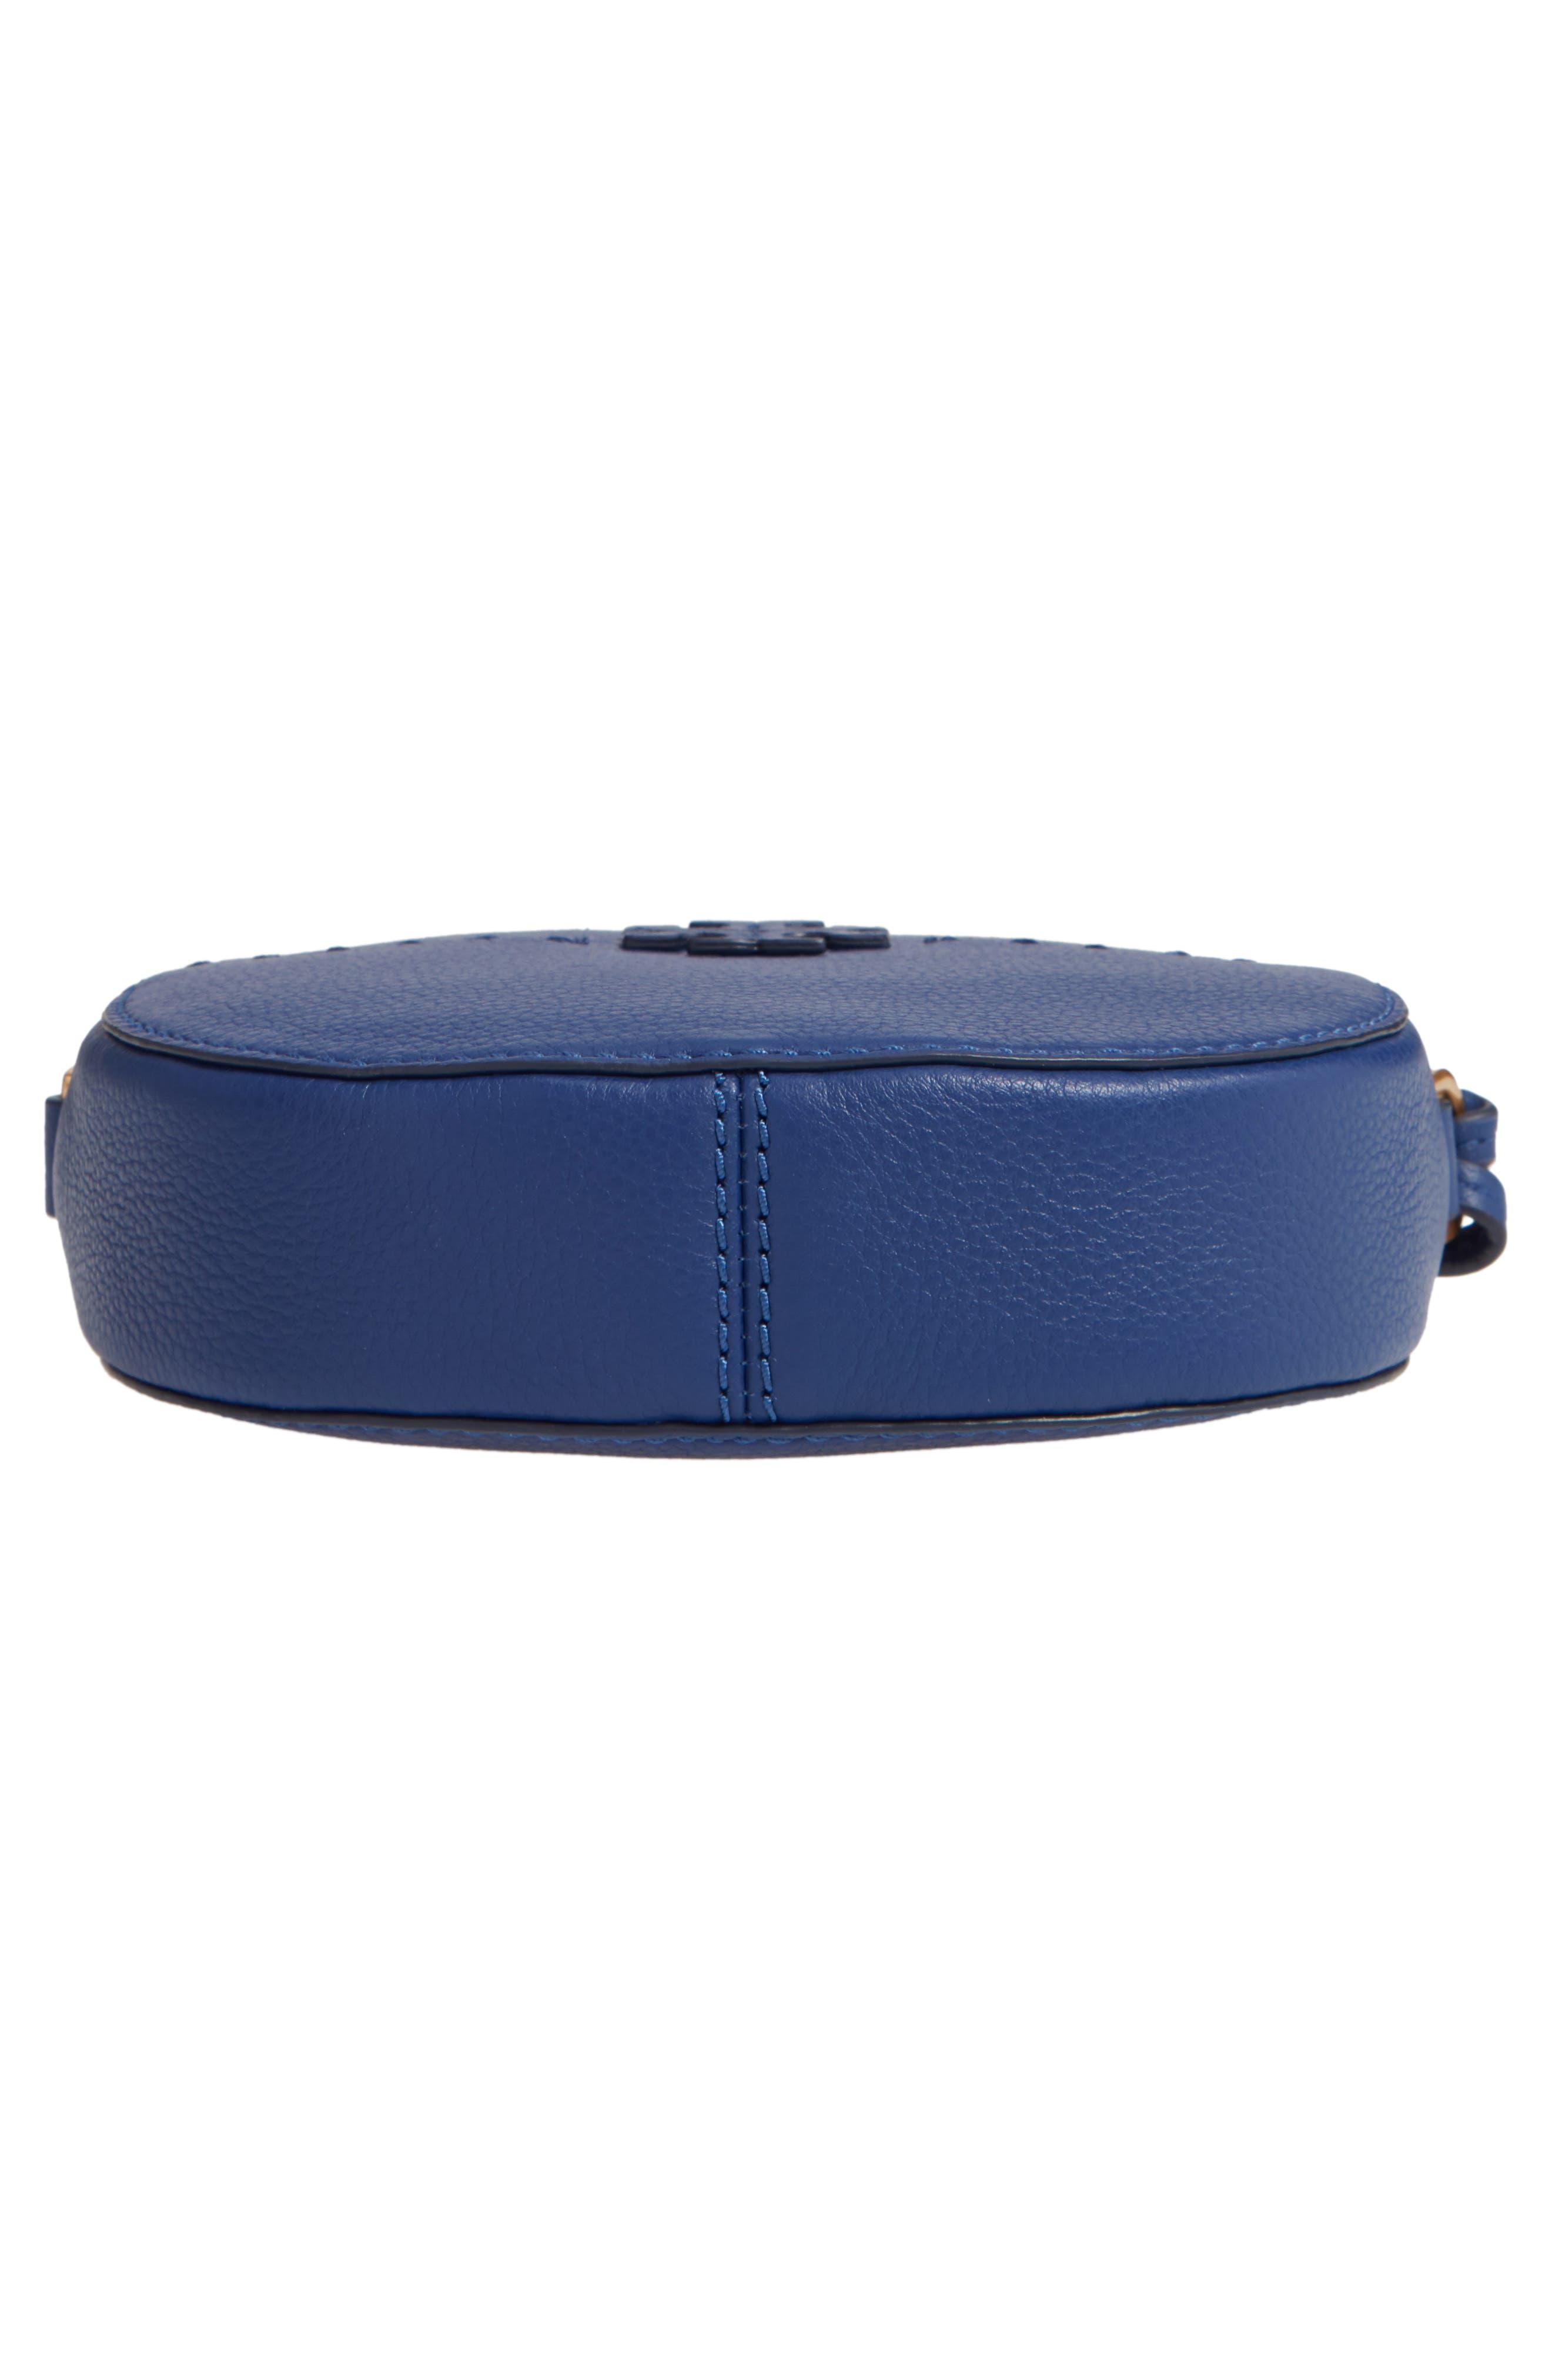 McGraw Leather Crossbody Bag,                             Alternate thumbnail 6, color,                             BRIGHT INDIGO